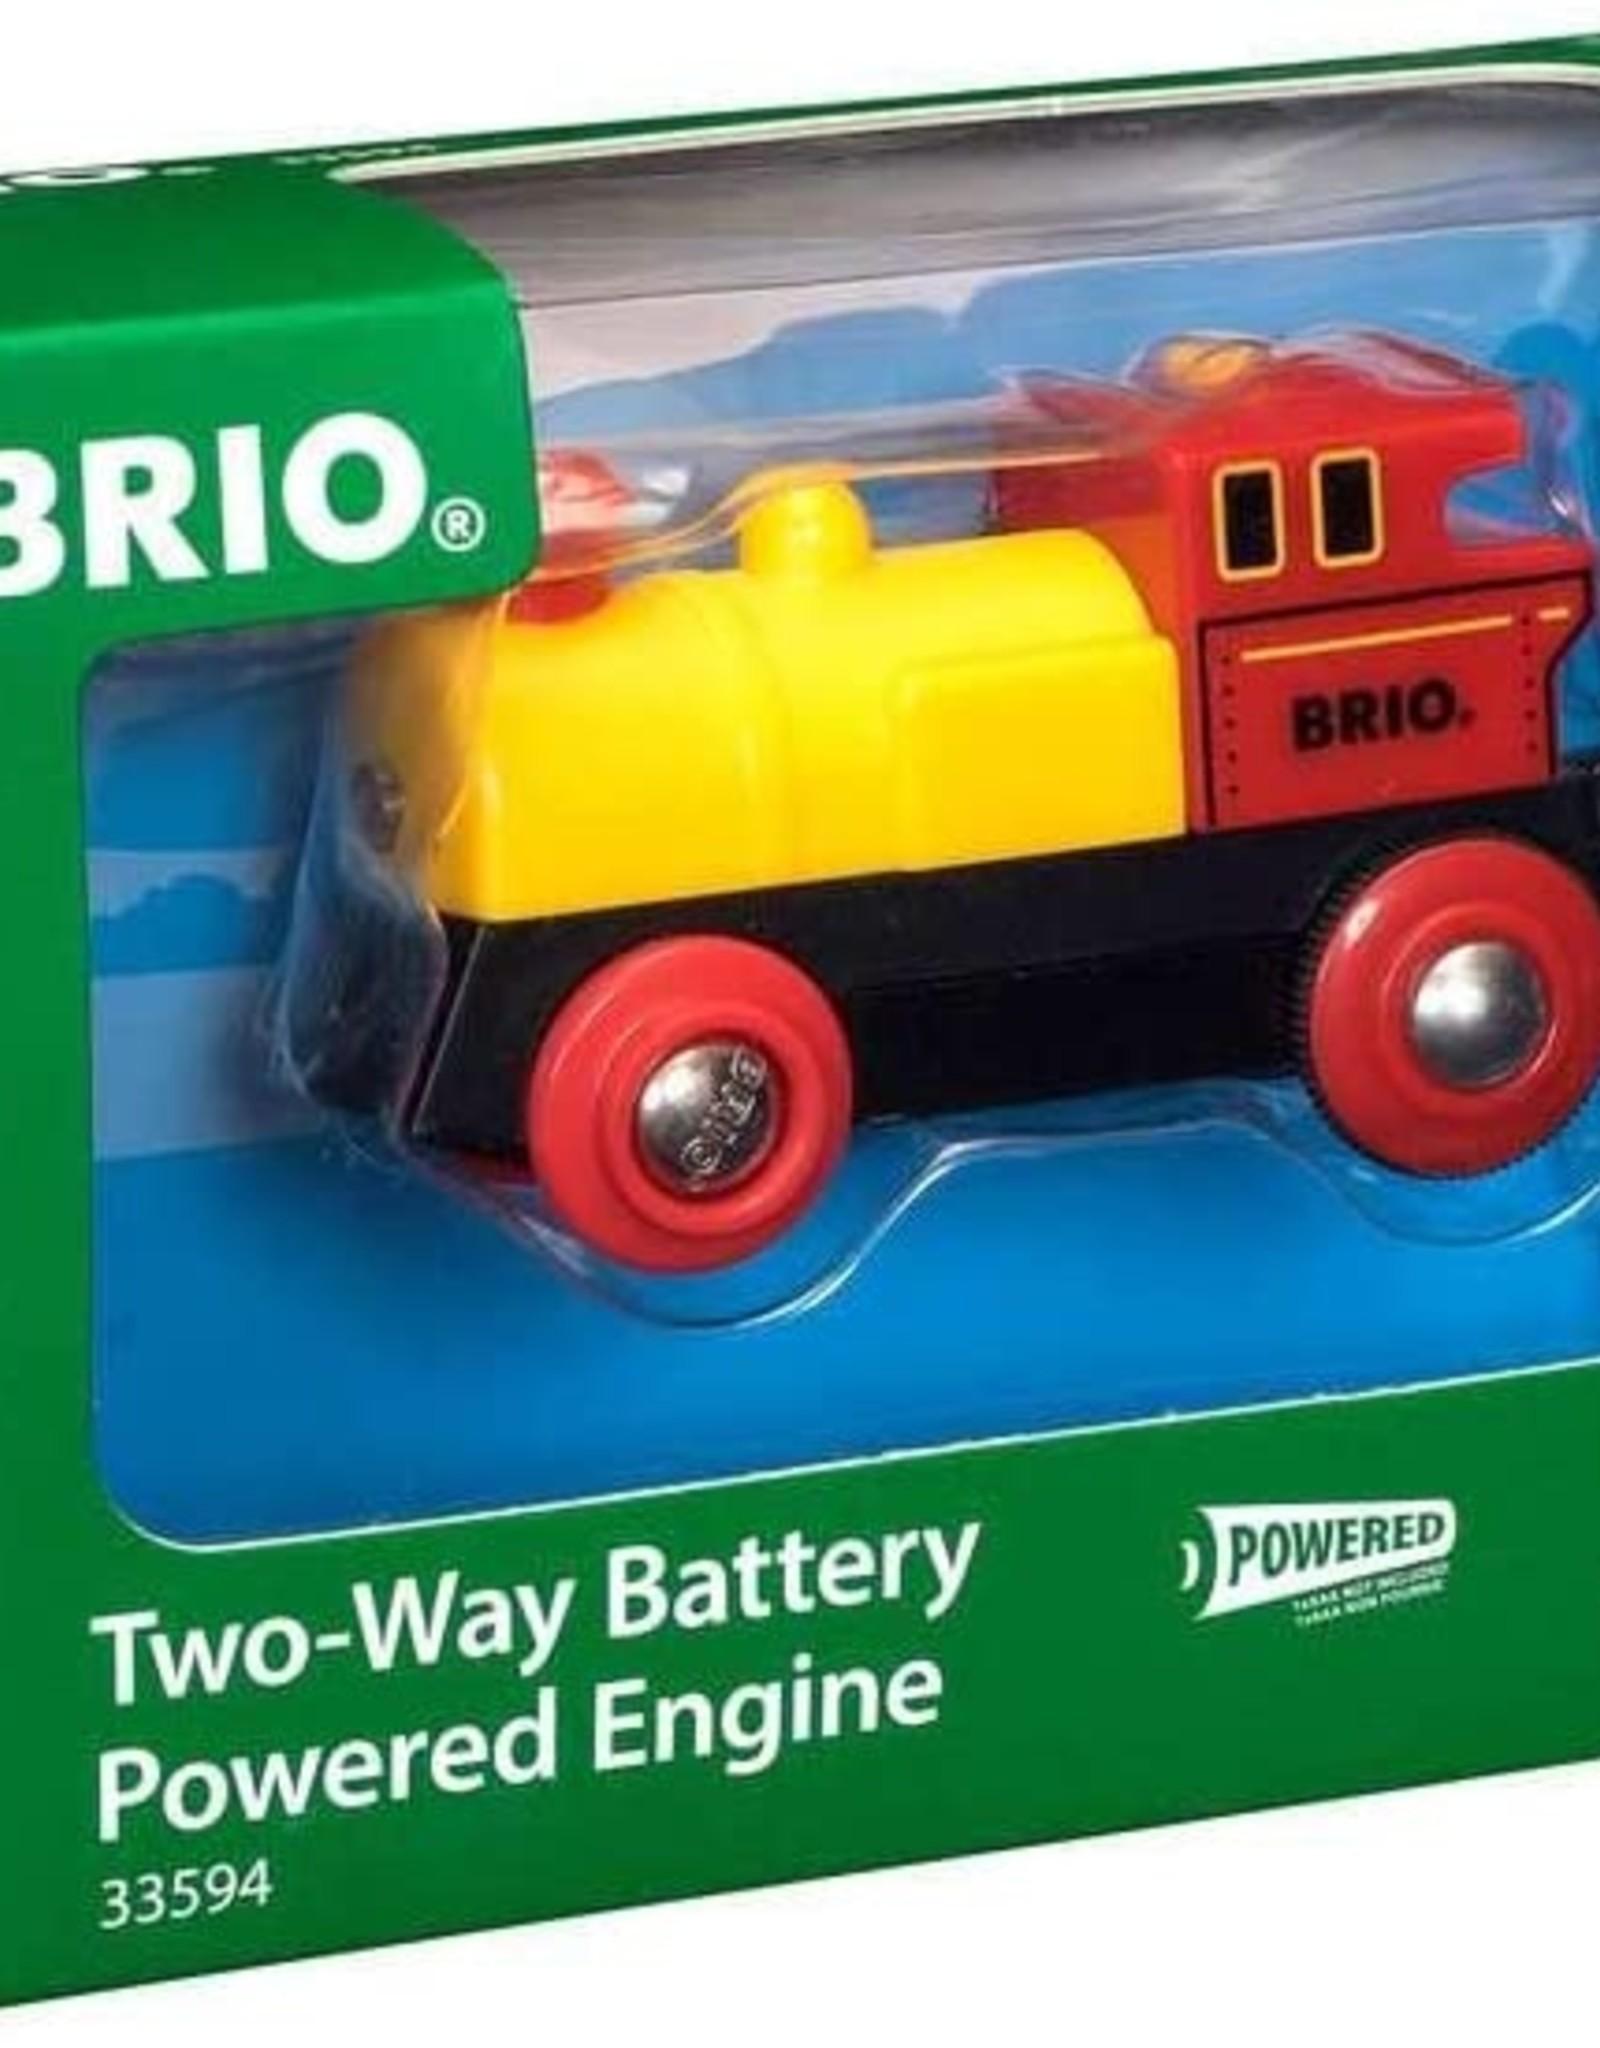 Brio BRIO Two Way Battery-Powered Engine